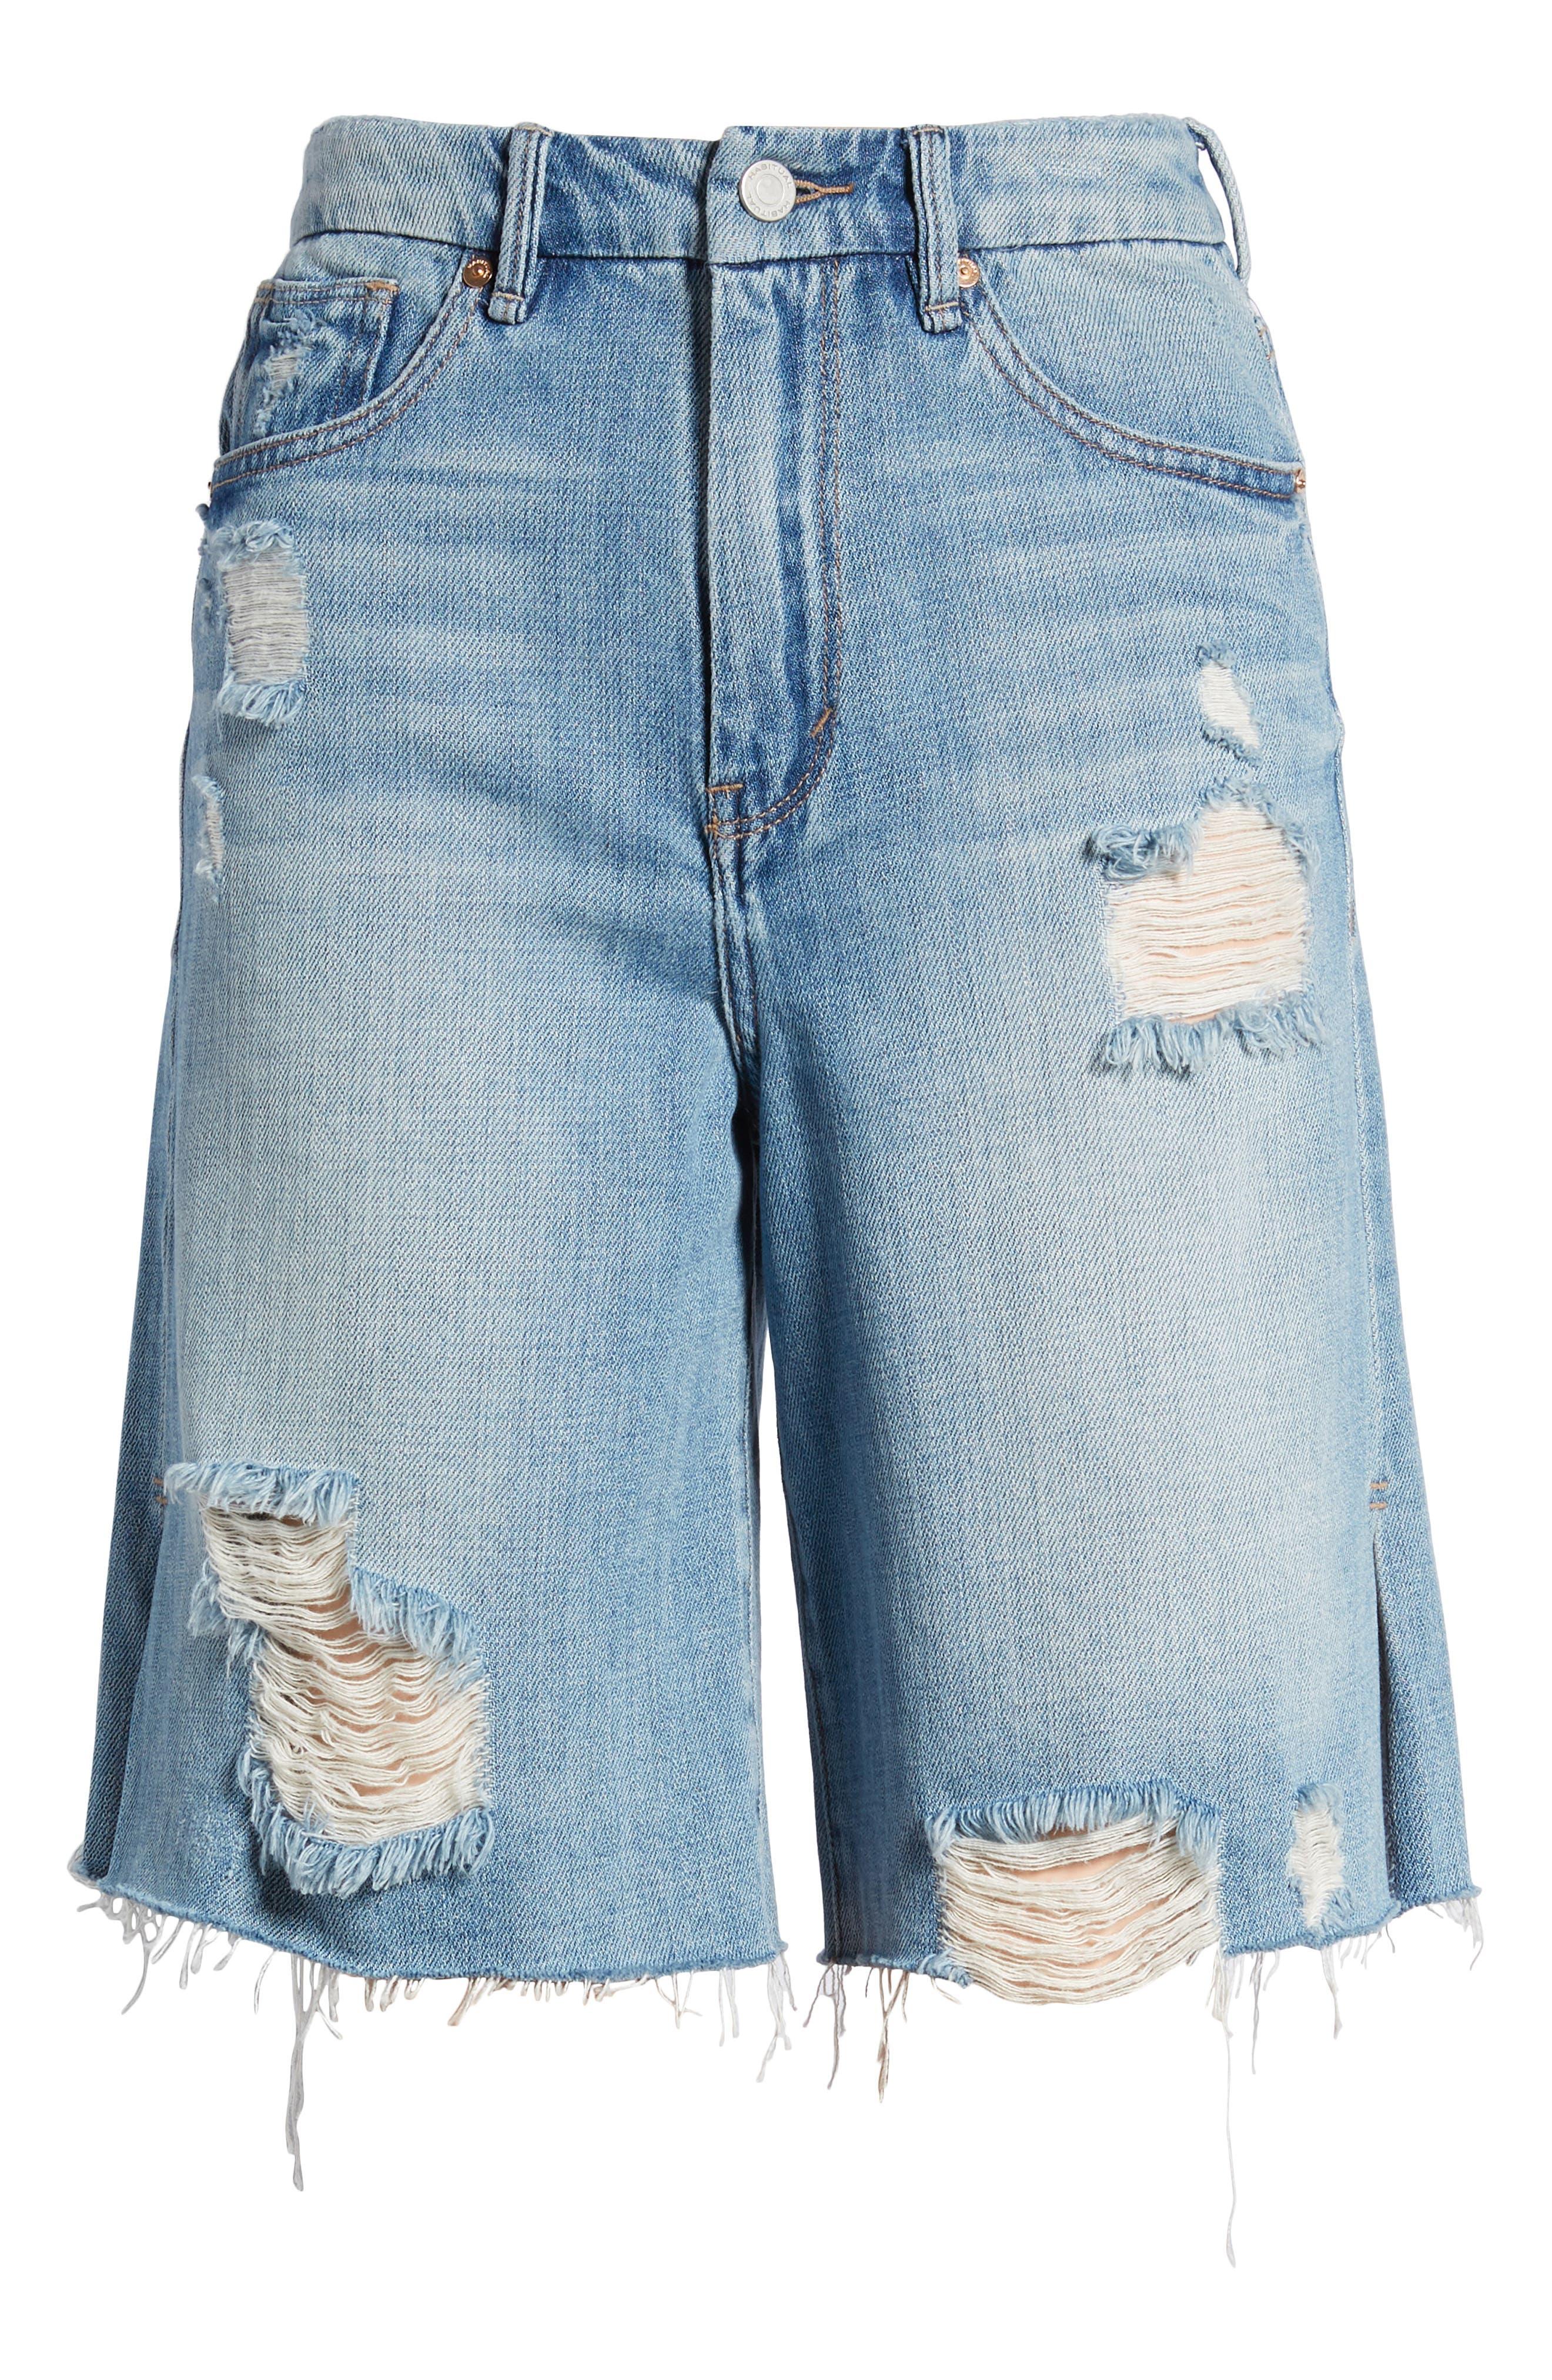 Wylie High Rise Distressed Bermuda Denim Shorts,                             Alternate thumbnail 7, color,                             Varnish